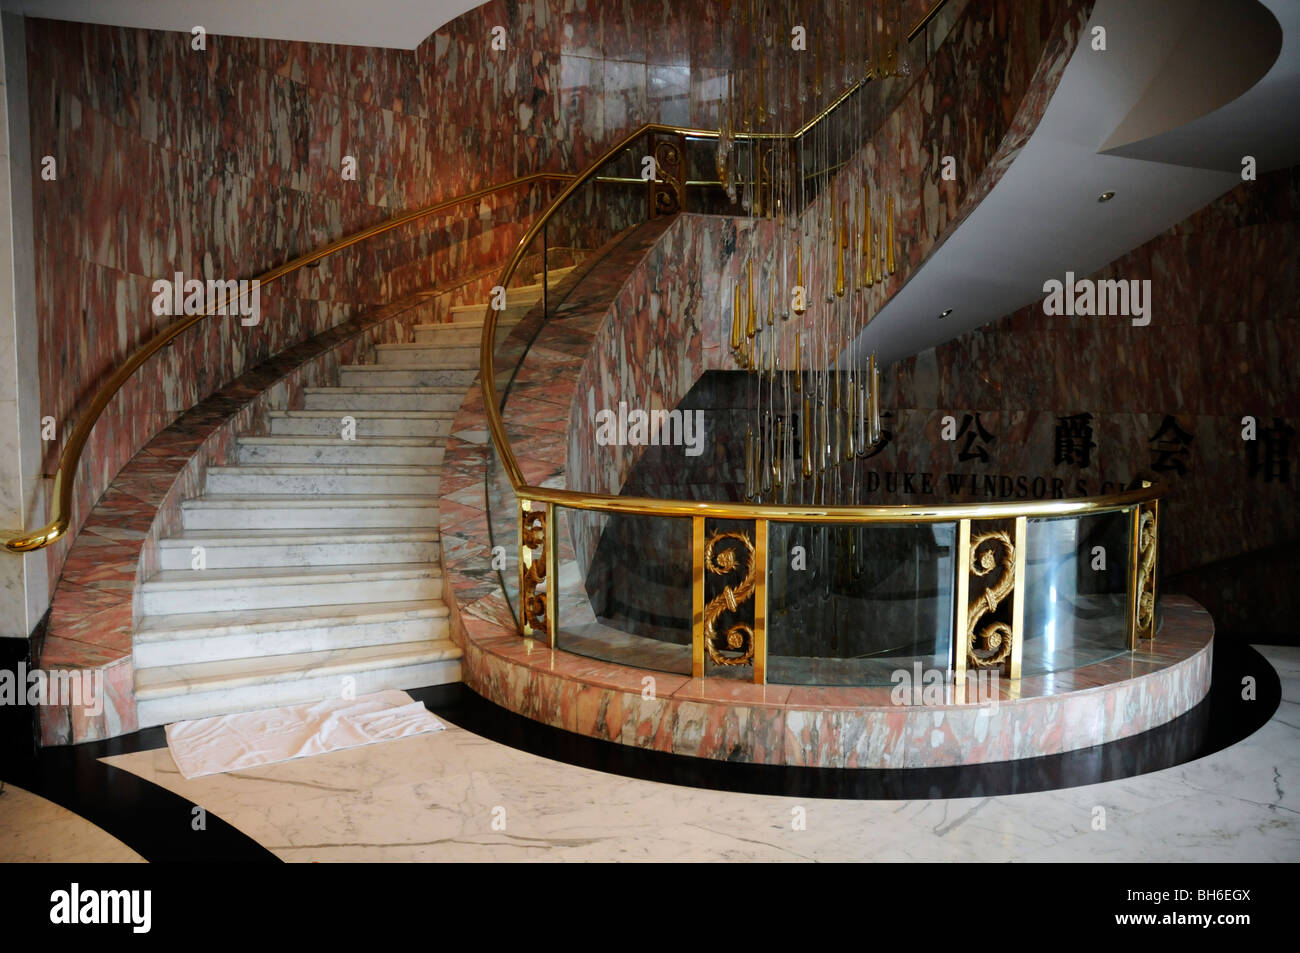 Posh hotel staircase in Dalian, China - Stock Image